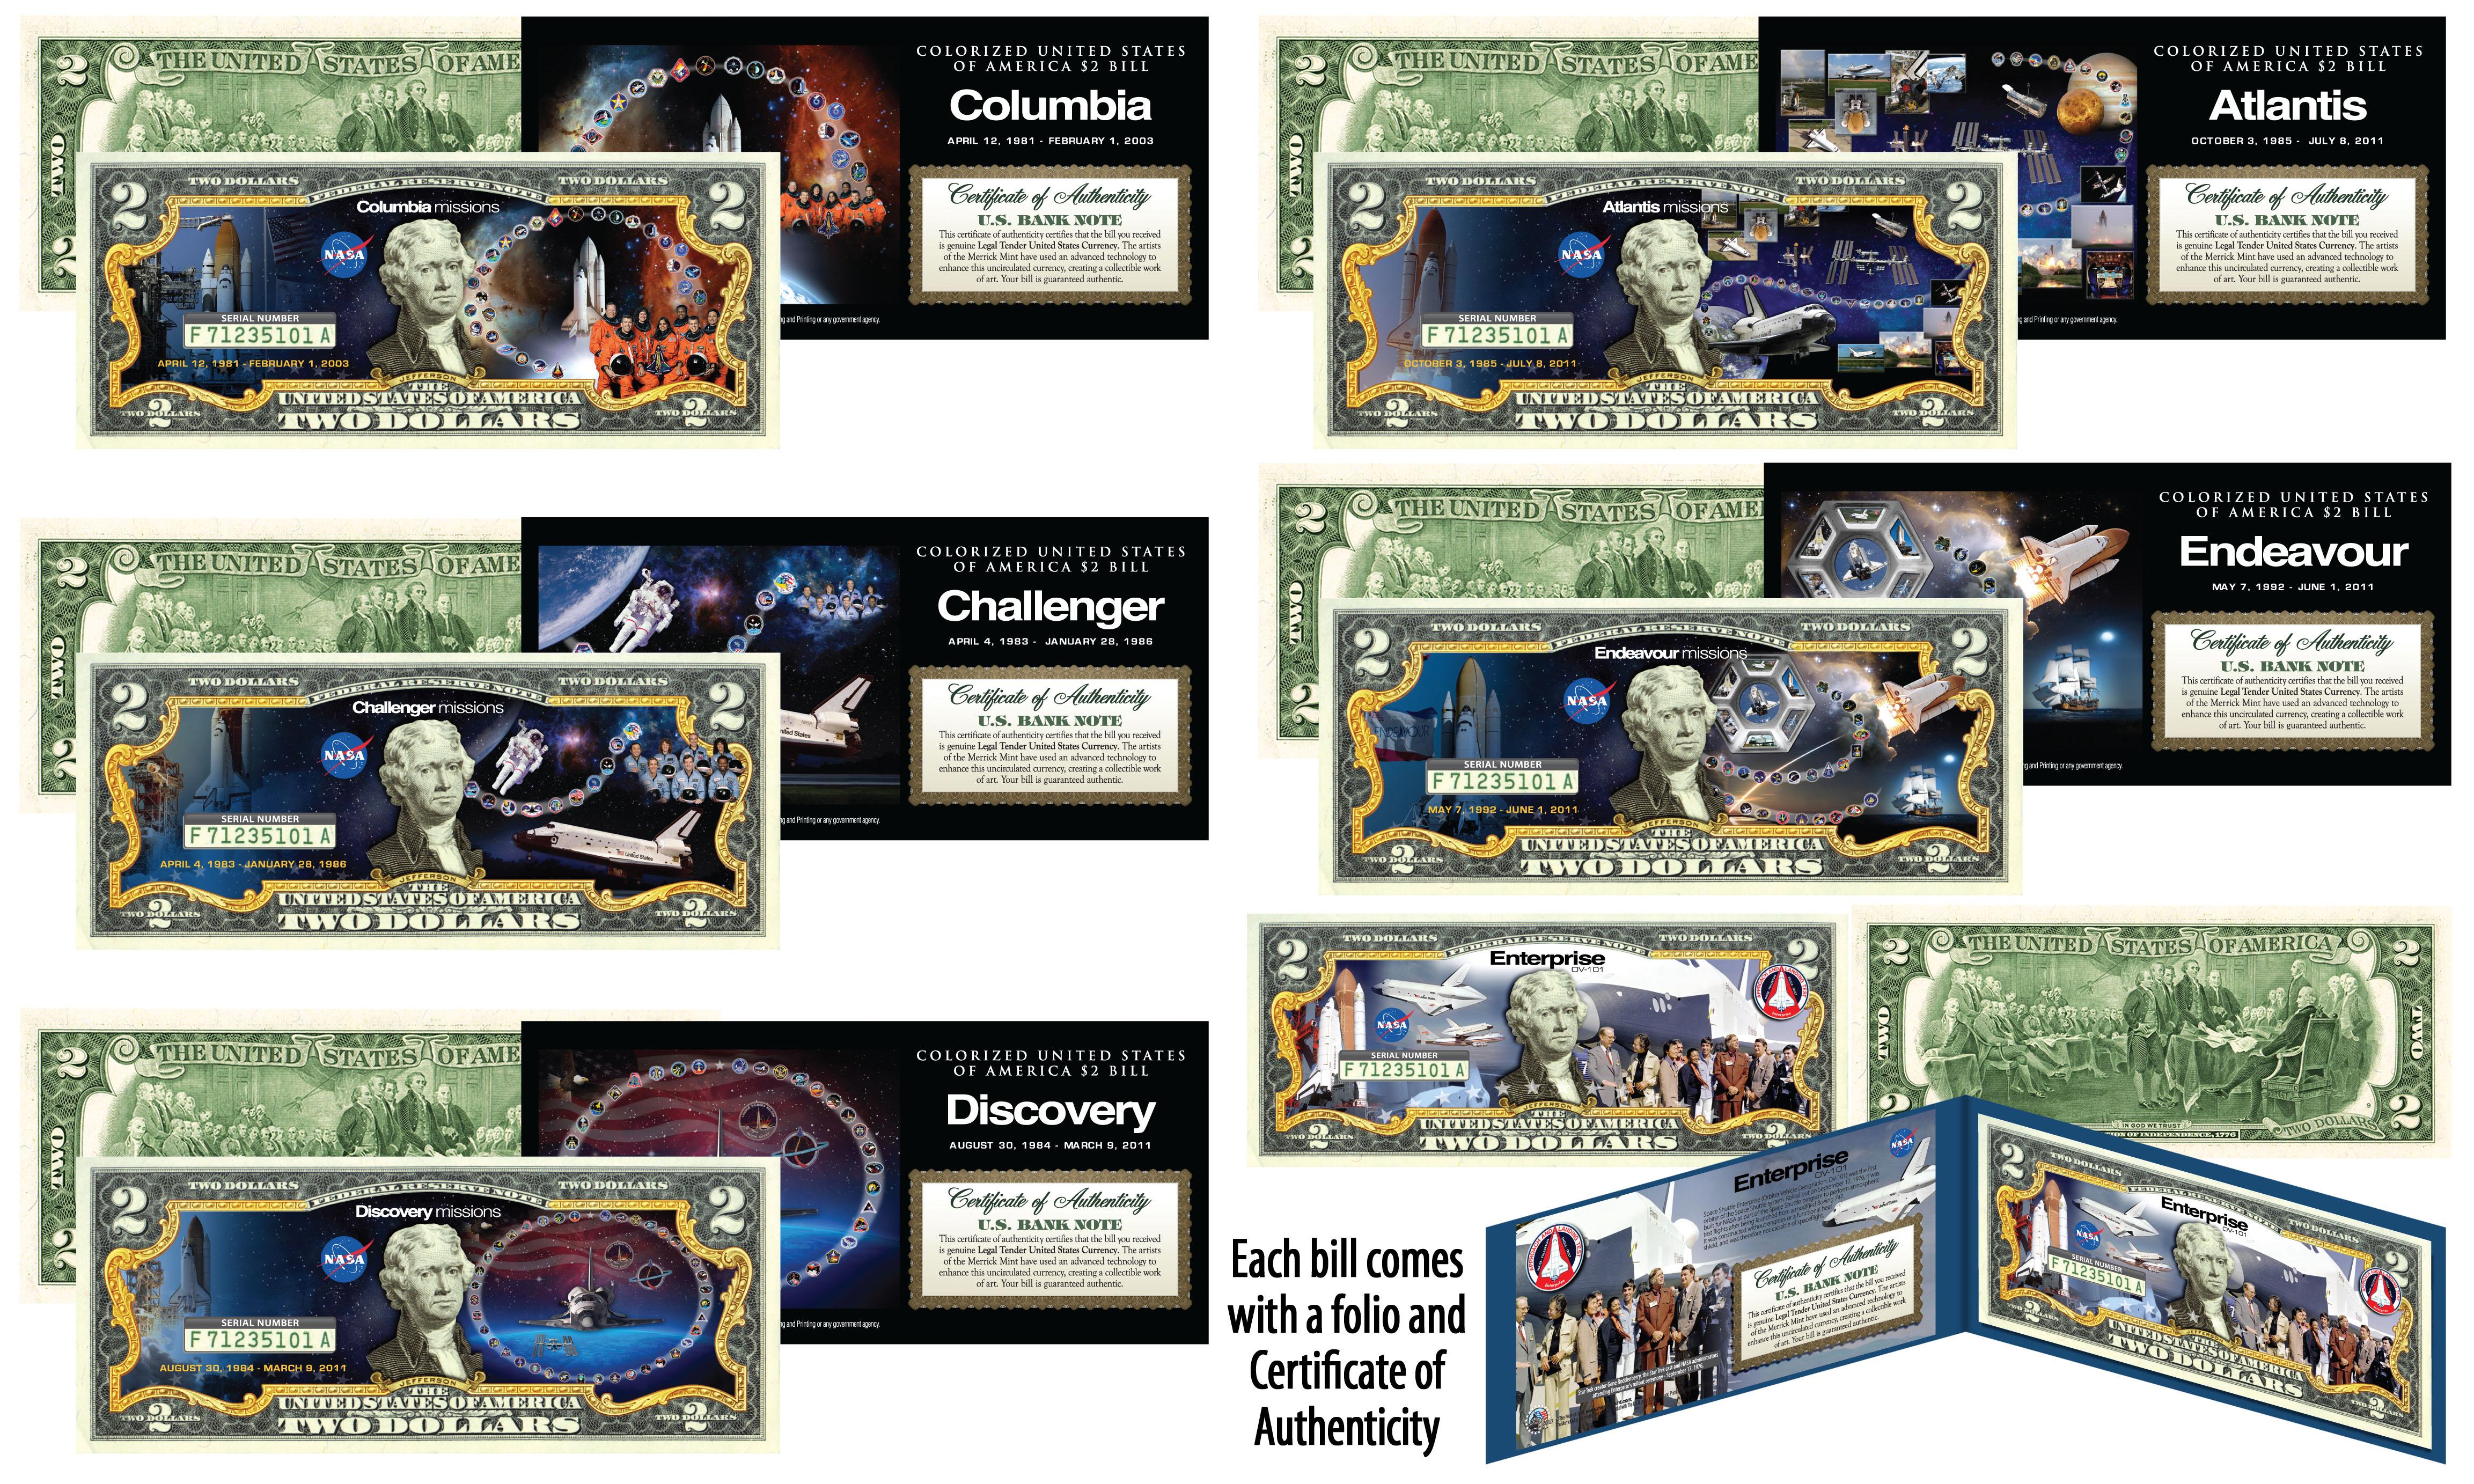 JAMES BUCHANAN President Colorized $2 Bill US Genuine Legal Tender 15th U.S